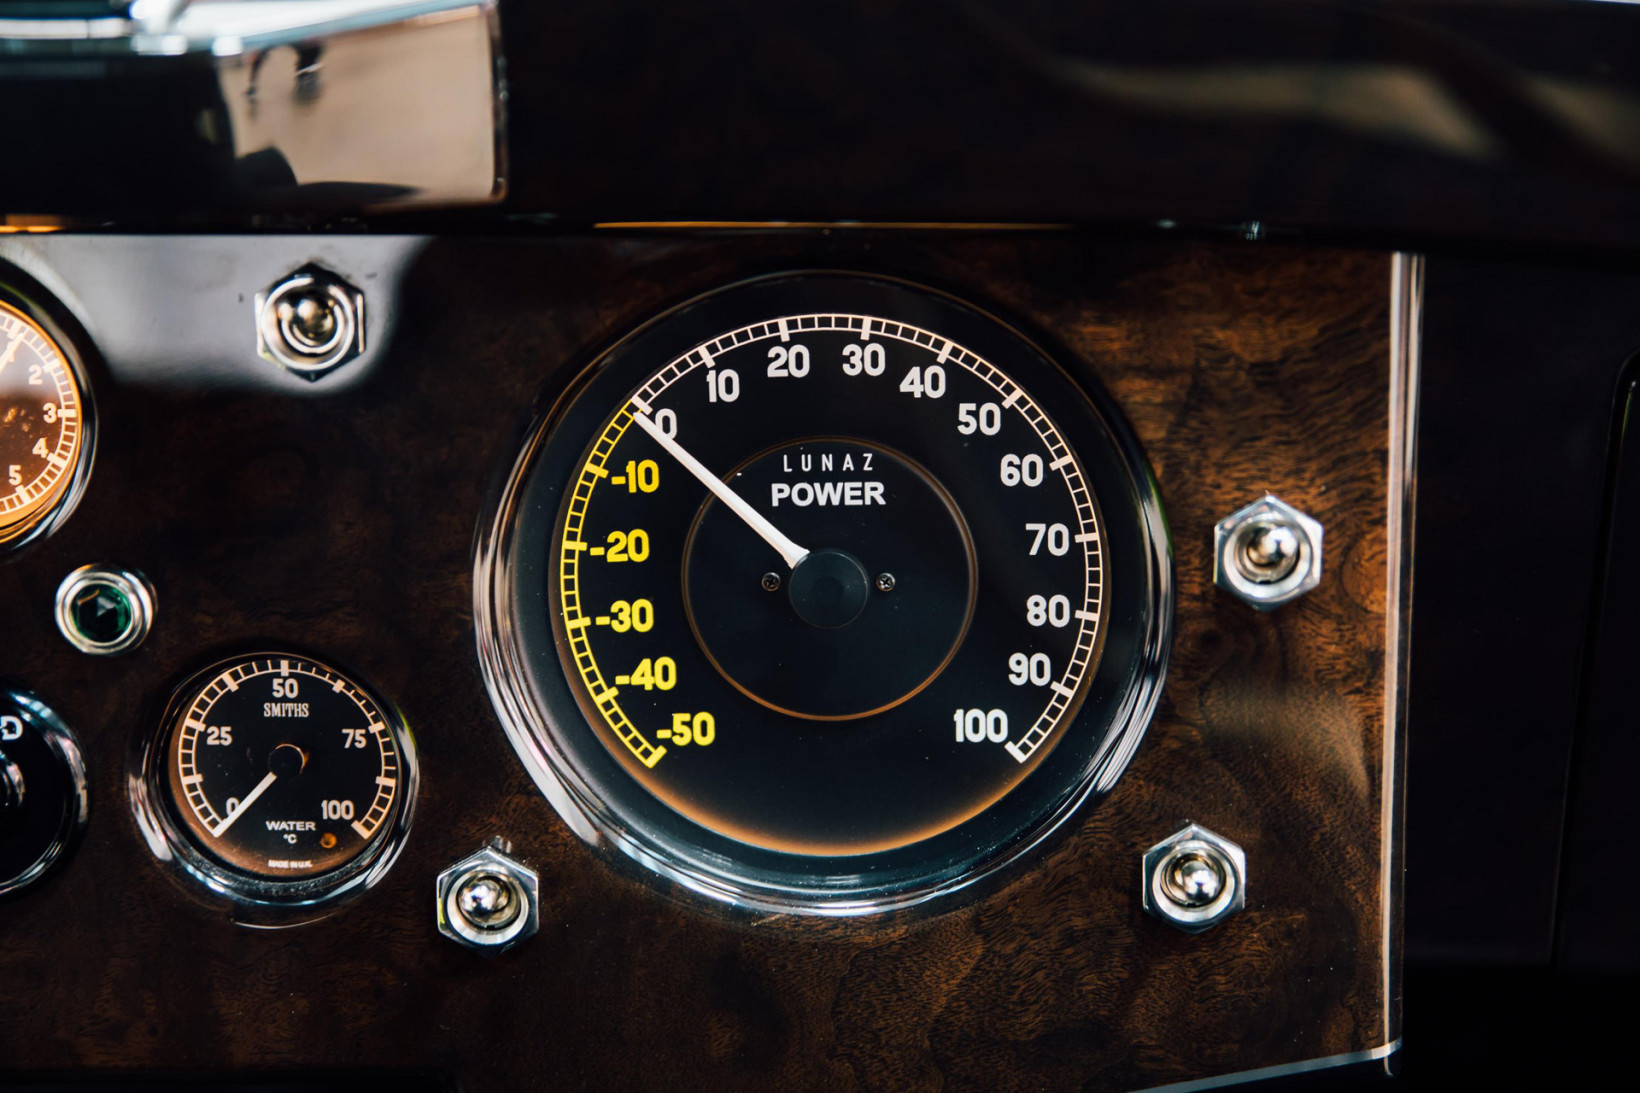 lunaz, xk120, jaguar, regenerative, braking, dial